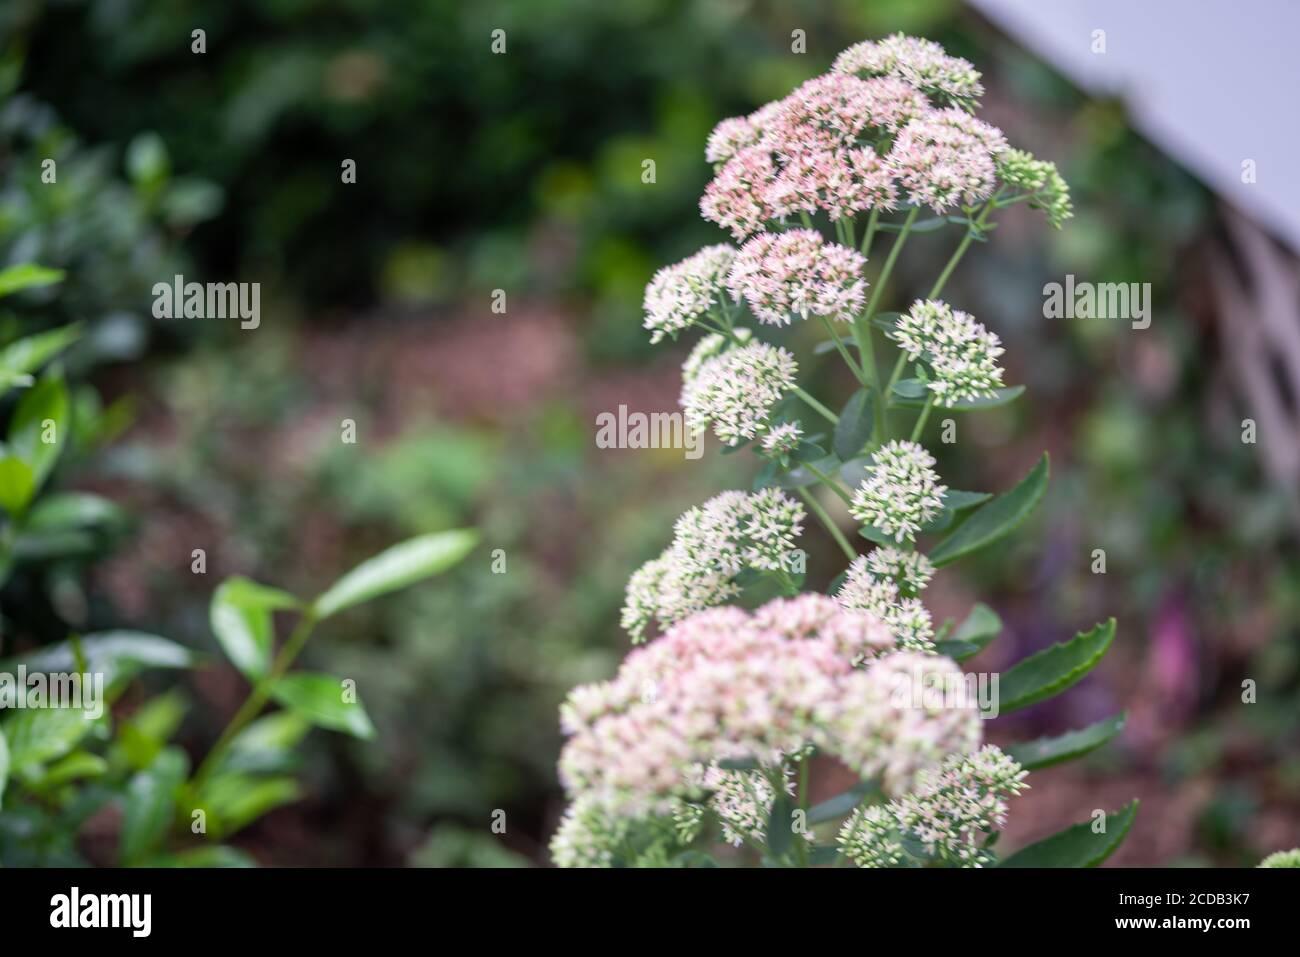 Geschmorte Rhabarber Mountain Sedum sukkulents in voller Blüte im Sommer. Stockfoto